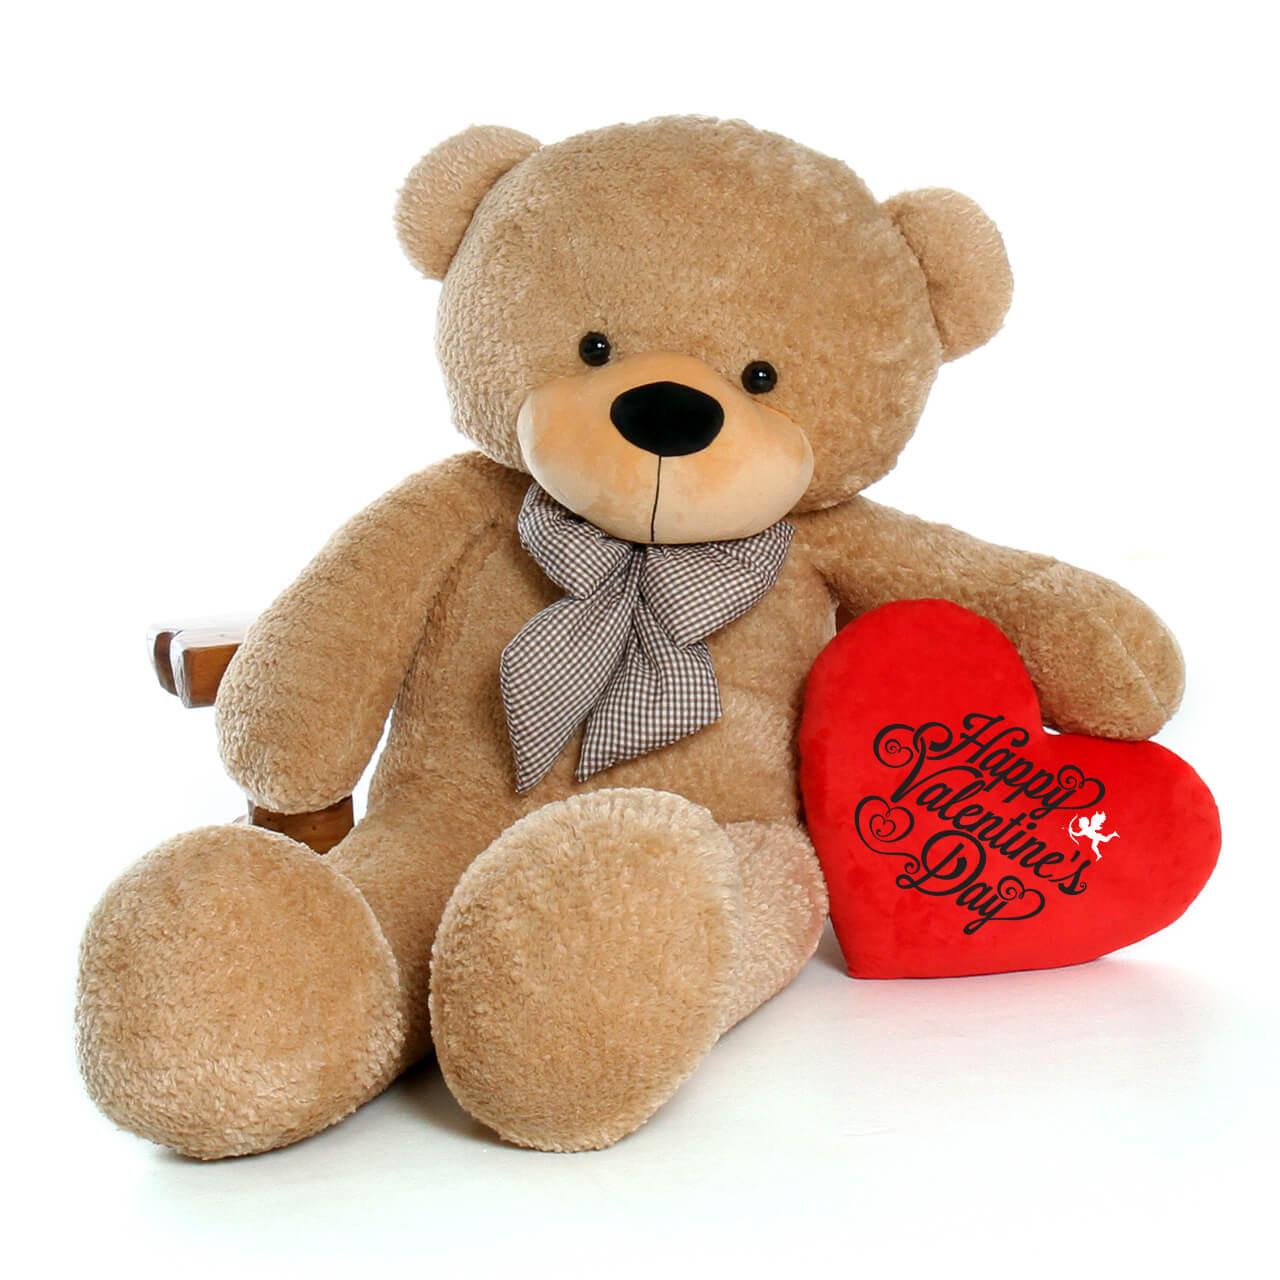 Happy Valentine's Day Unique Valentines Day Gift for her